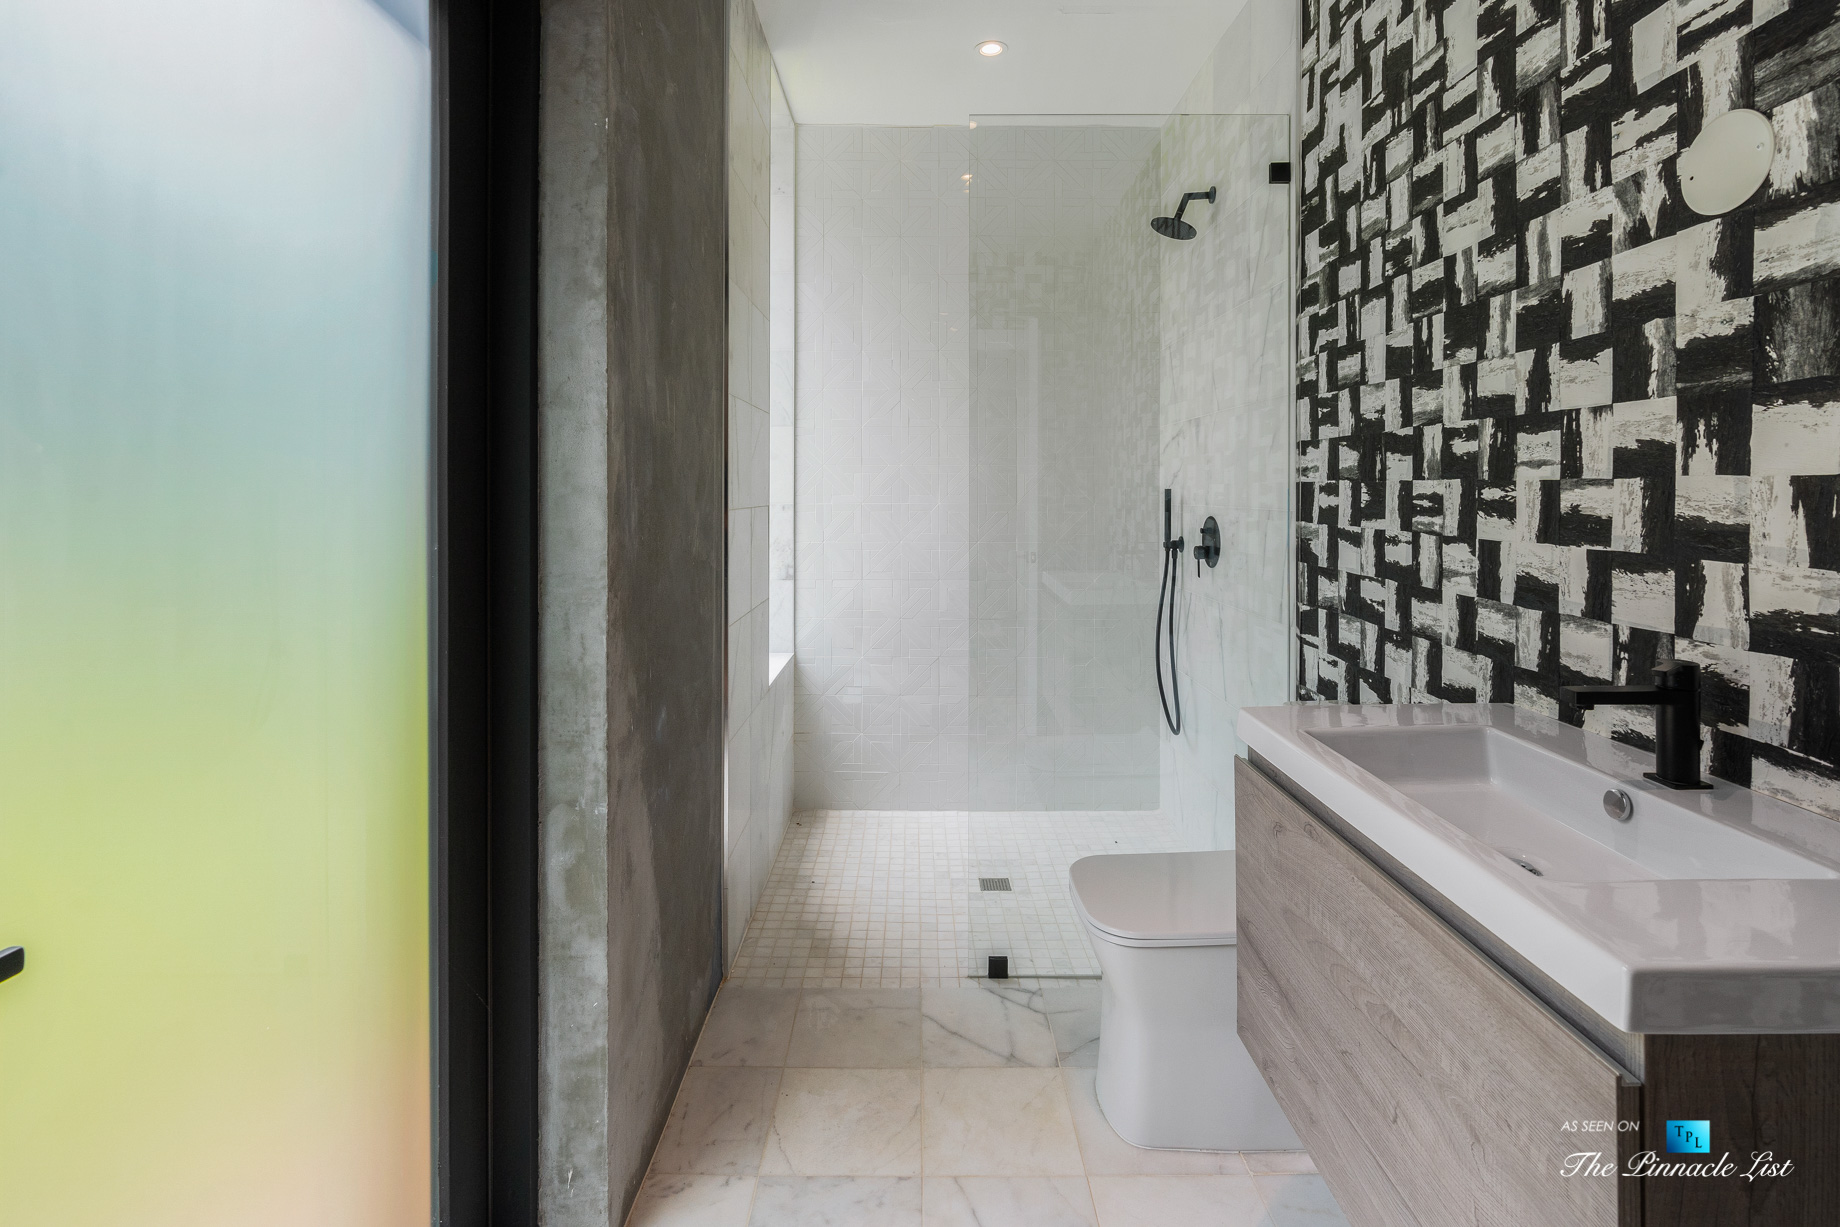 2716 Ridgewood Rd NW, Atlanta, GA, USA - Bathroom with Shower - Luxury Real Estate - Modern Contemporary Buckhead Home